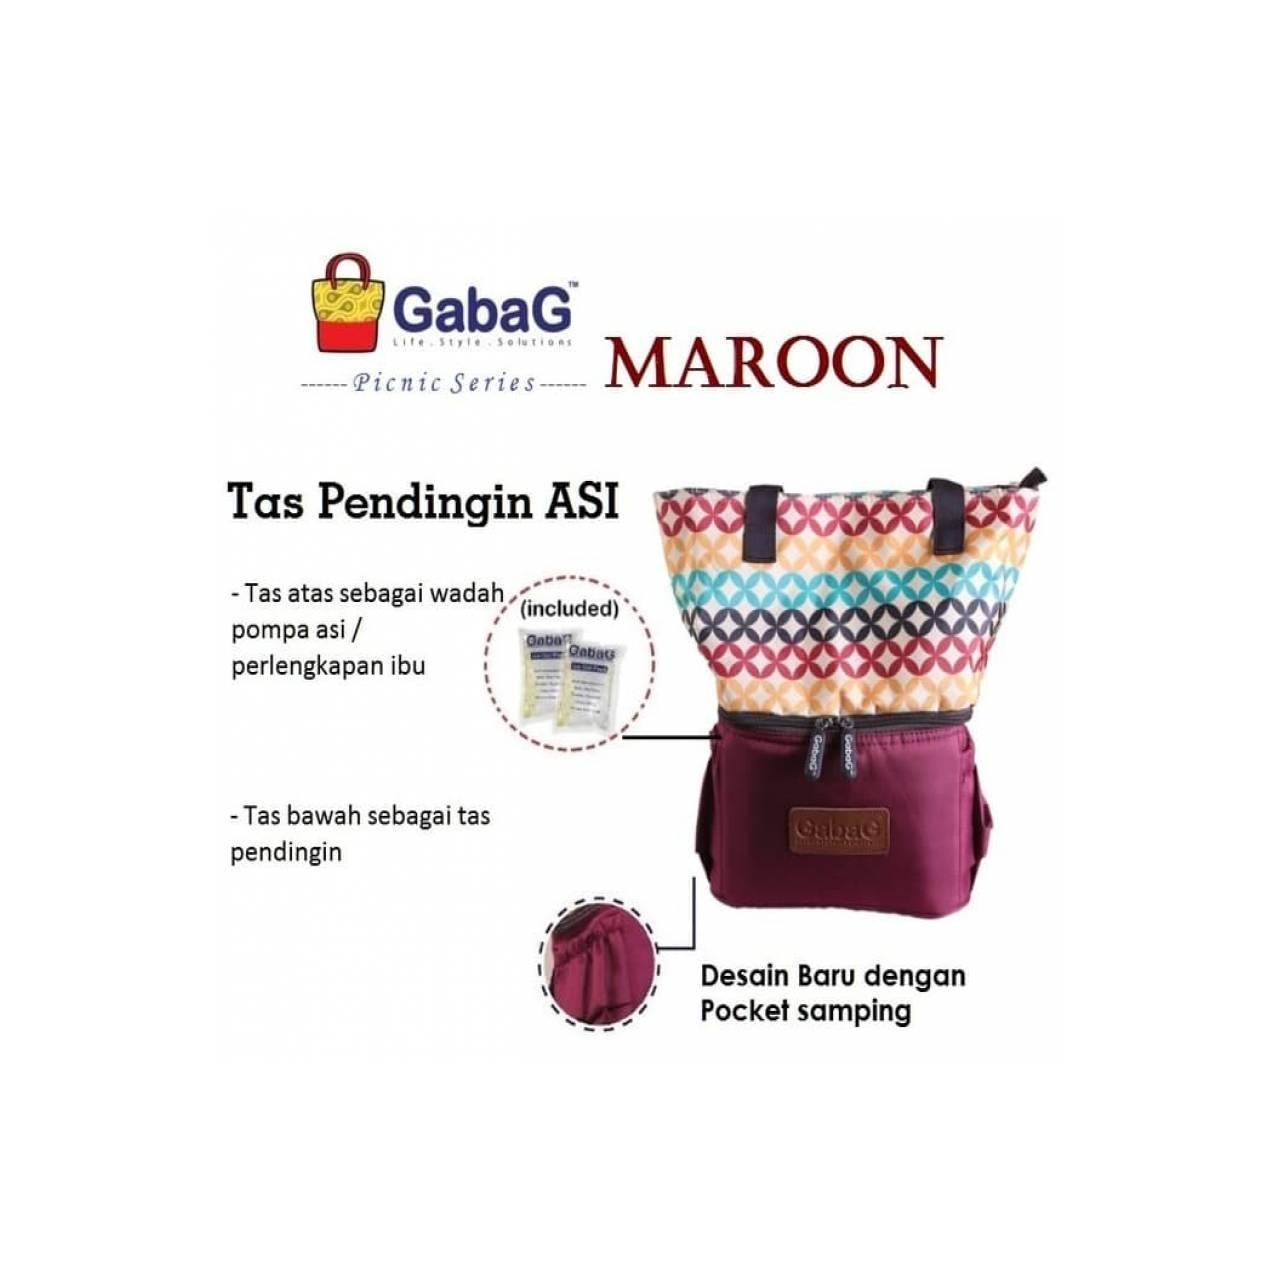 Gabag Cooler Bag Backpack Series Radja Ramada Free 2 Ice Gel Bags In 1 Picnic Maroon Coolerbag Tas Asip Asi